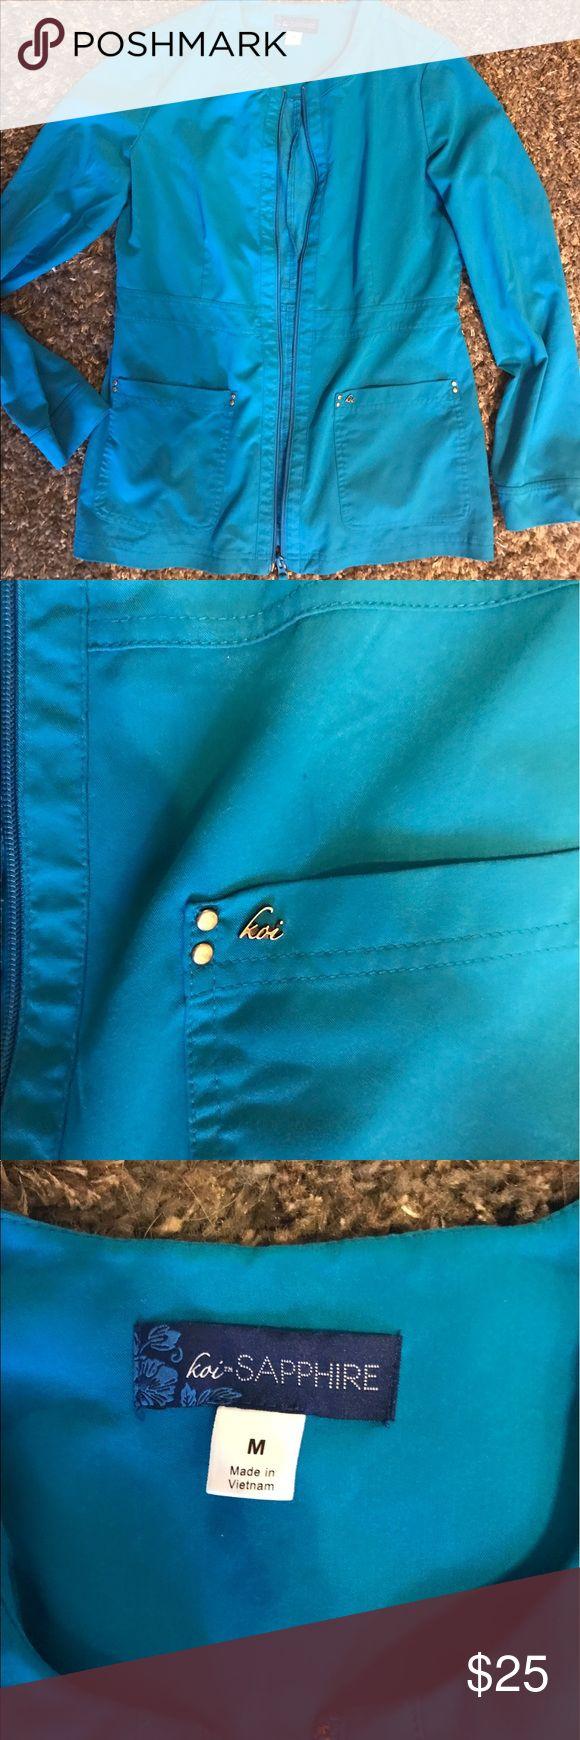 Koi scrub jacket Like new size medium koi scrub jacket koi Jackets & Coats